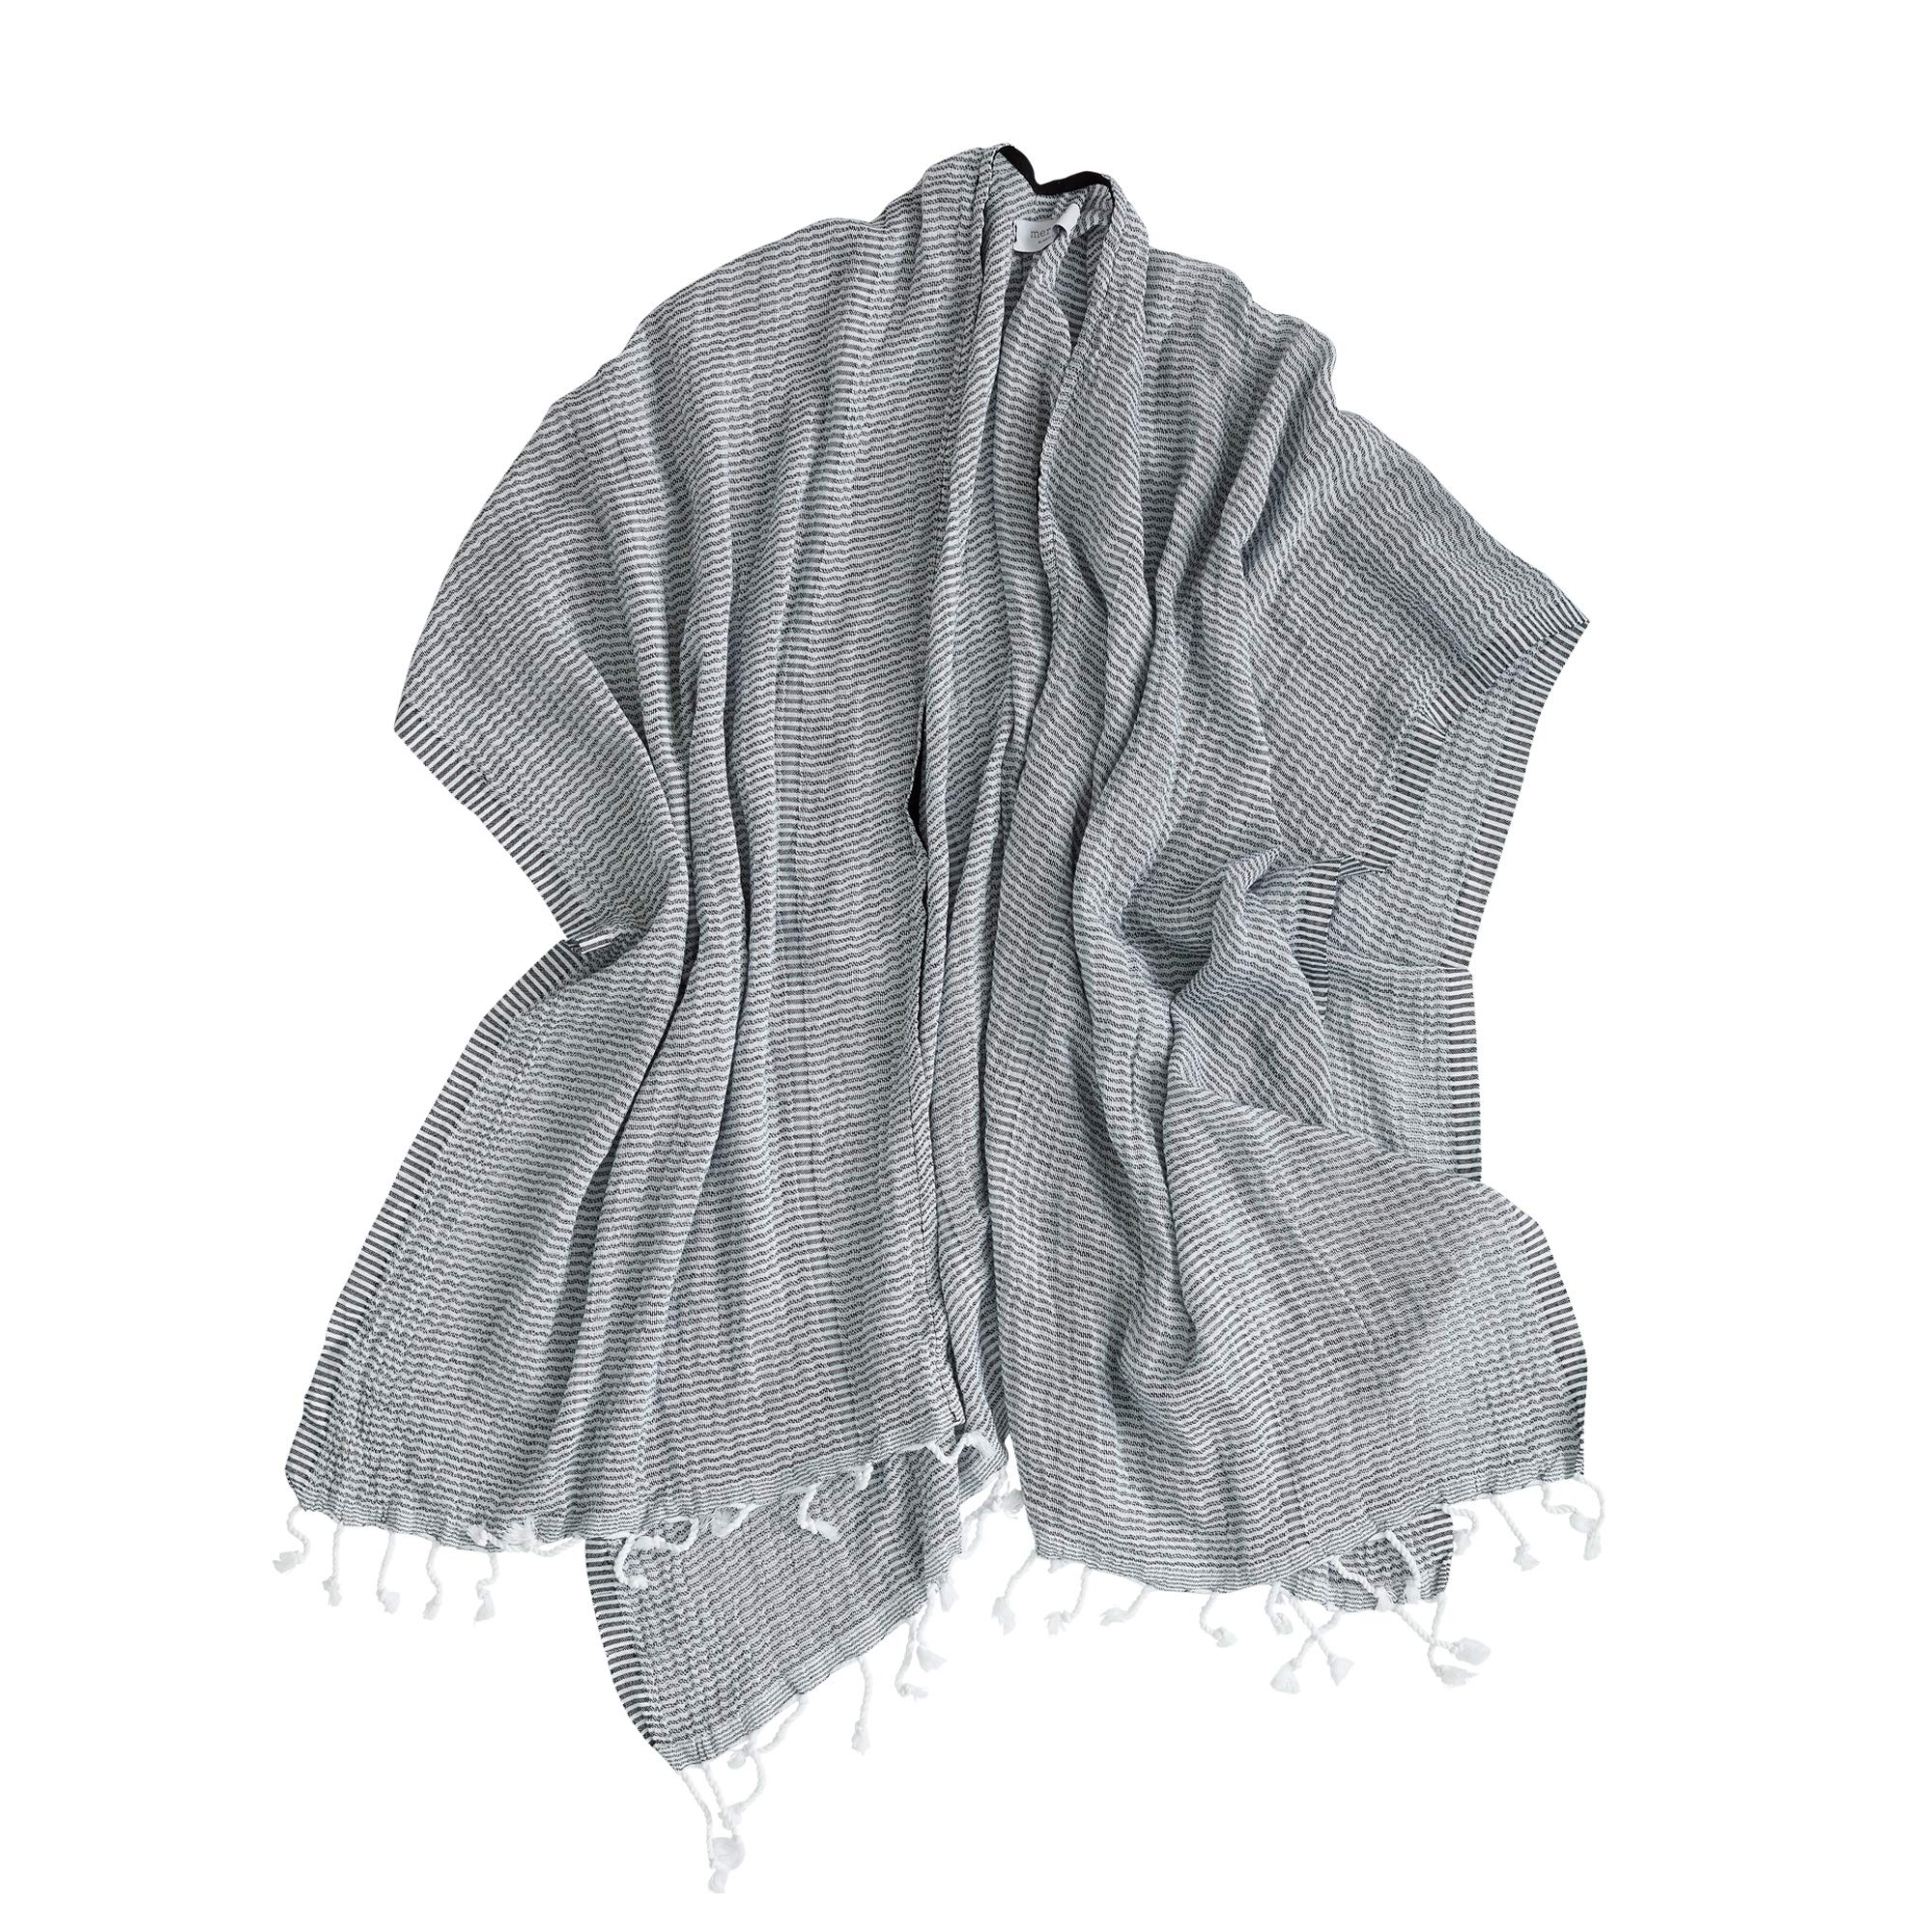 Mer Sea & Co Luxury Beach Wrap with Tote Bag - Midnight Navy Stripes - 100% Cotton (43'' x 65'')